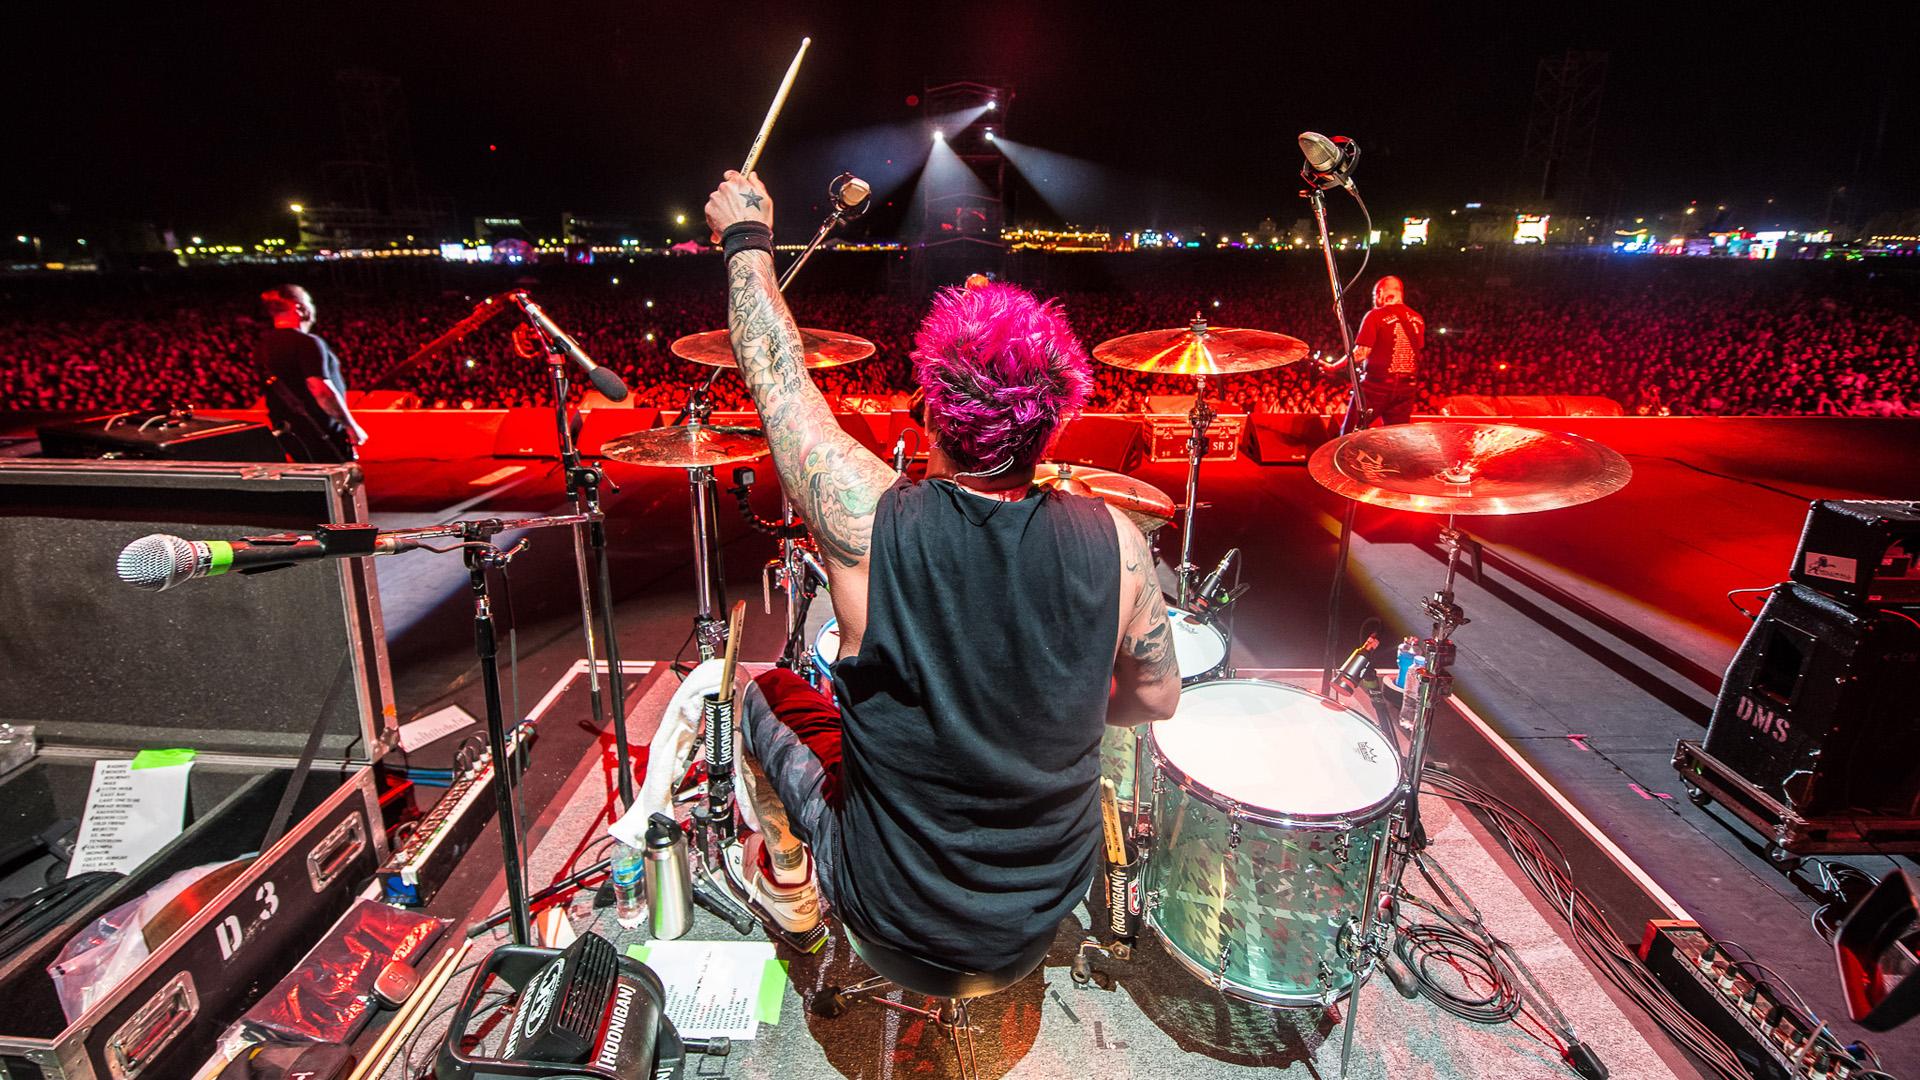 El show de Rancid en Lollapalooza